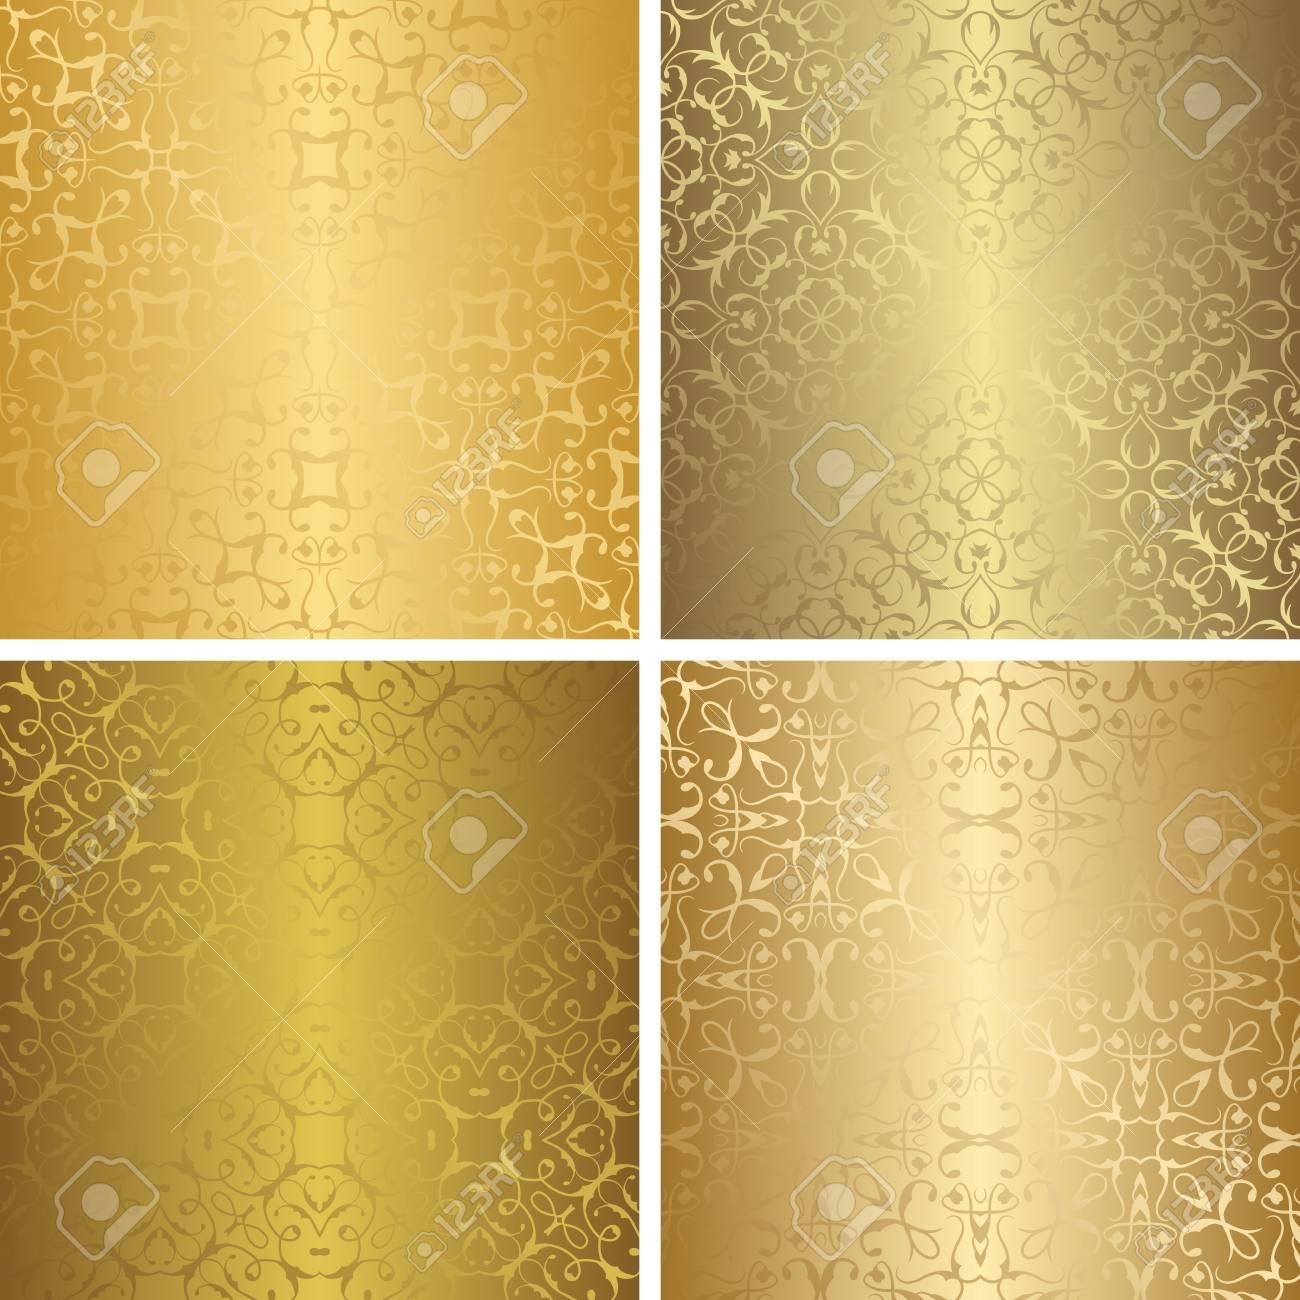 Set Of Luxury Seamless Patterns Vintage Design Retro Collection Golden Wallpaper Stock Vector